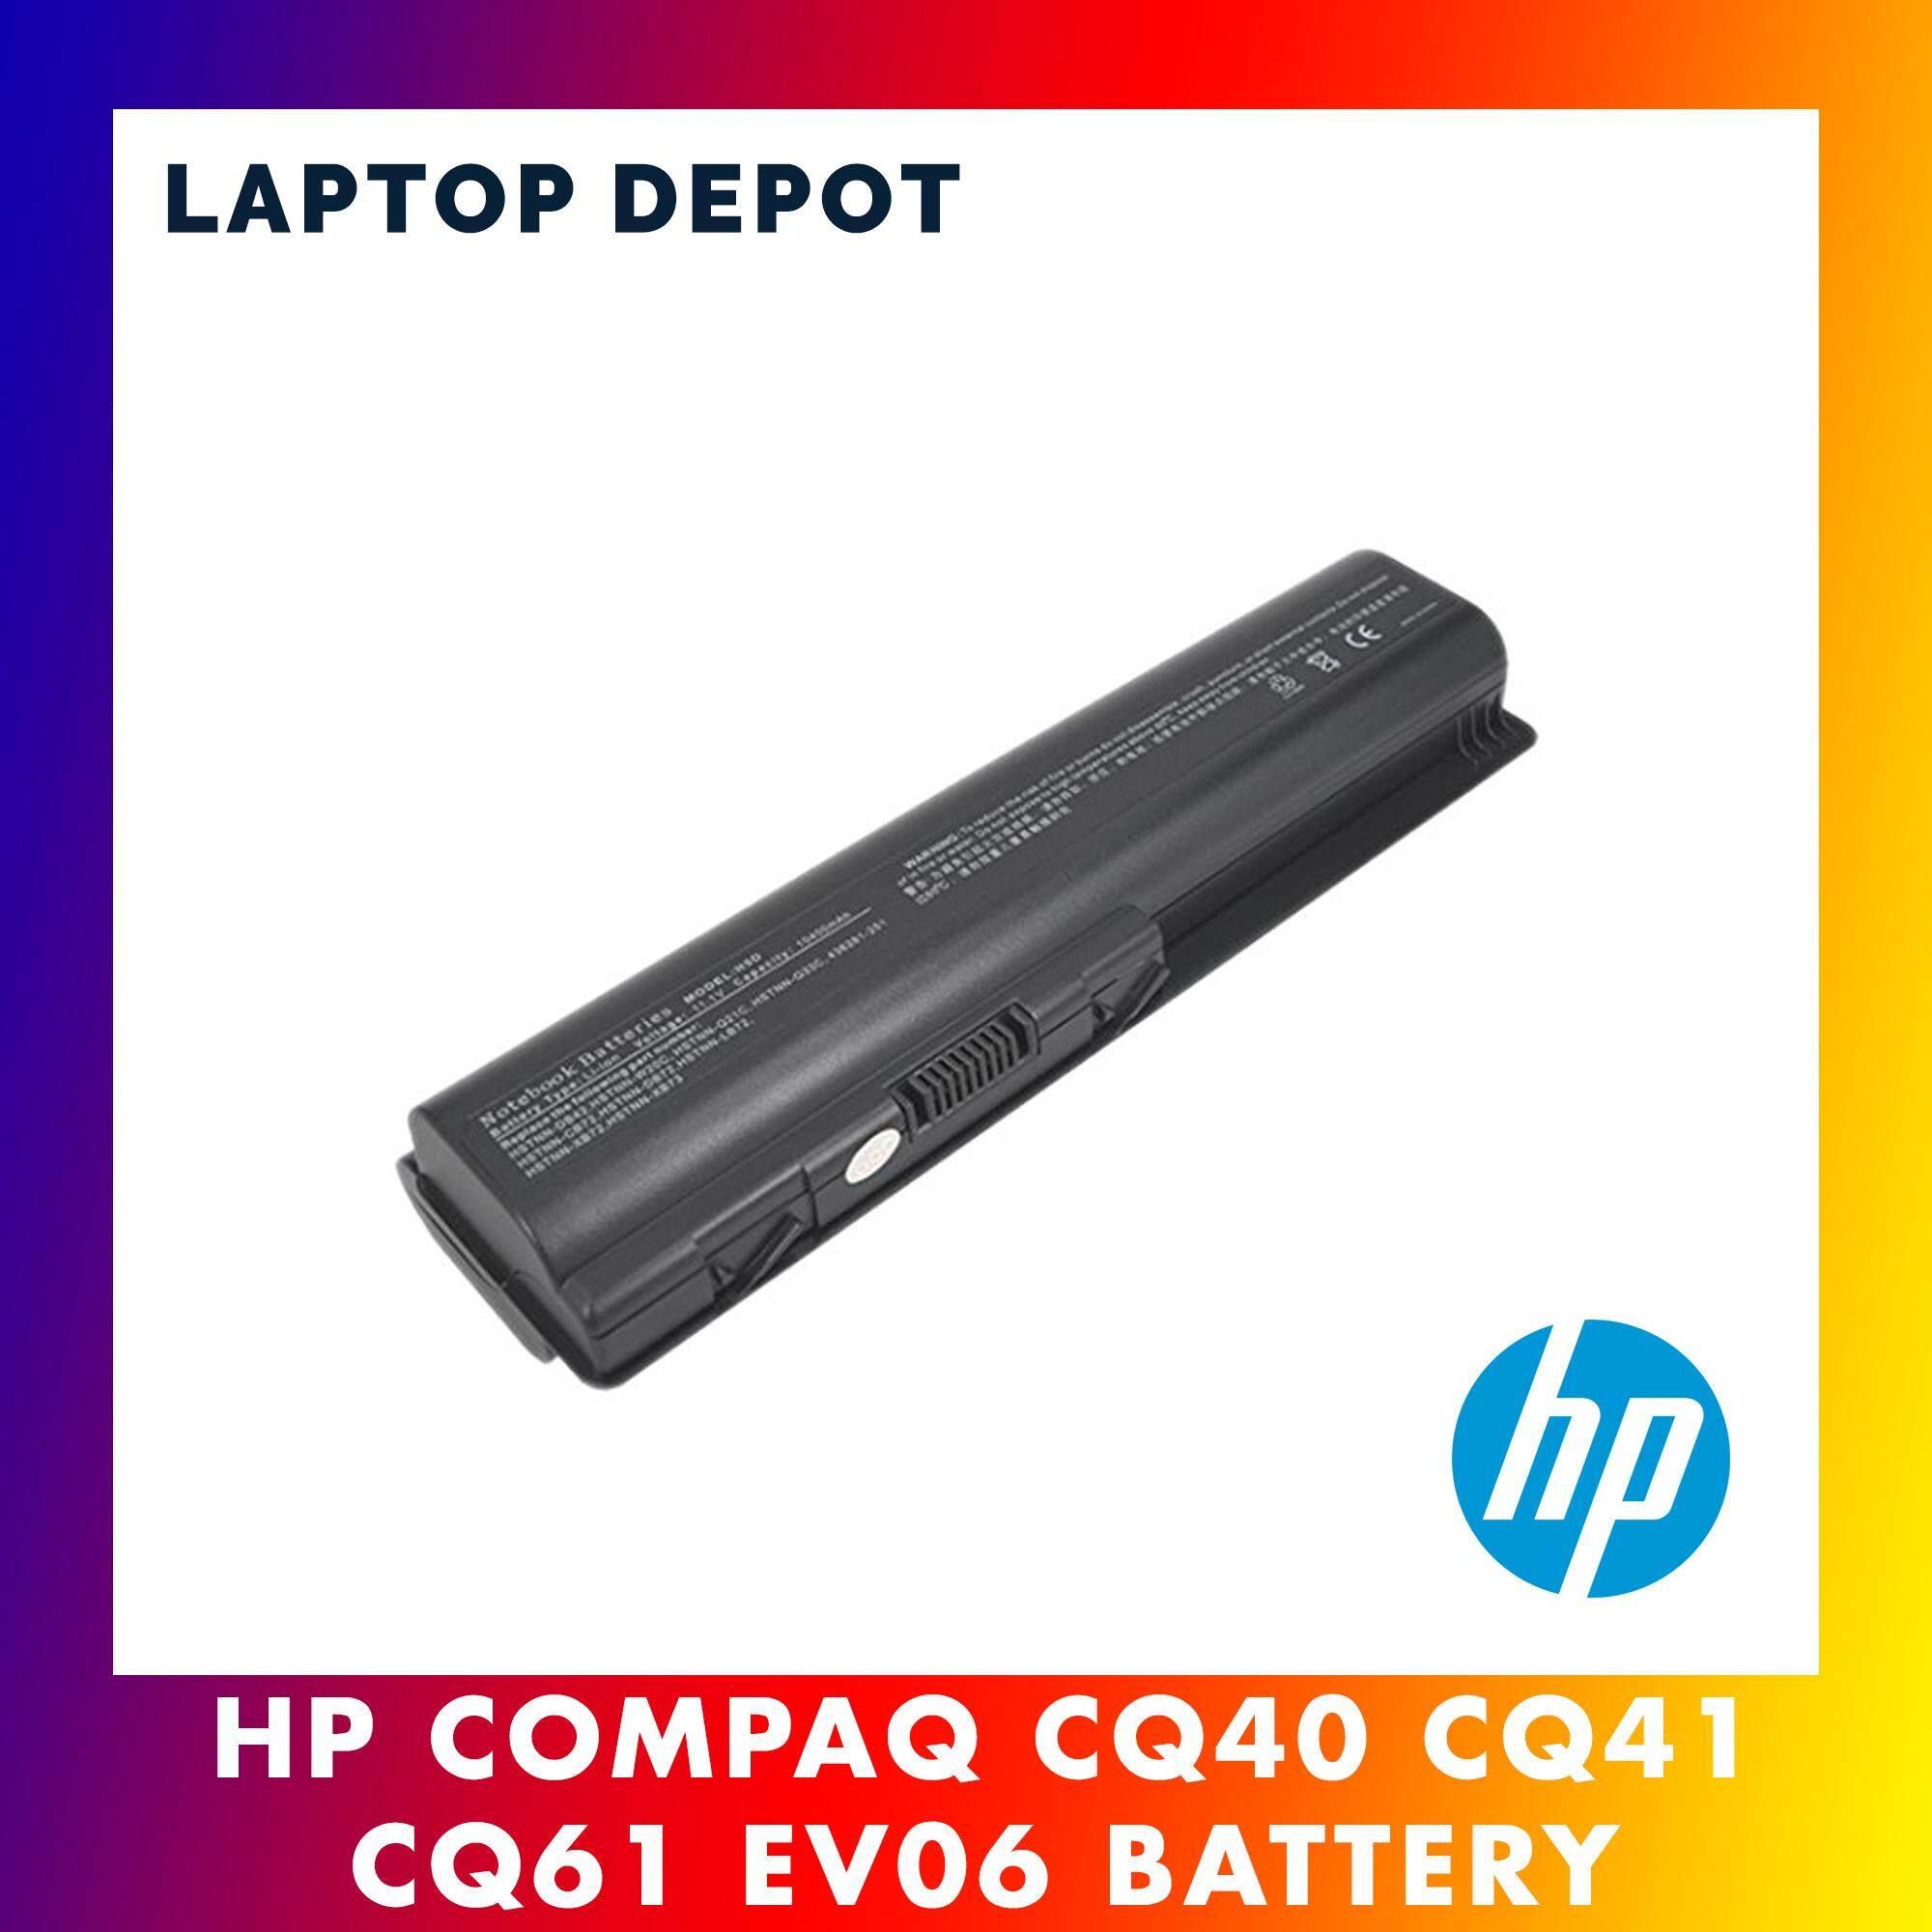 HP Compaq Presario CQ40 CQ41 CQ61 DV4 DV5 DV6 EV06 Battery Malaysia